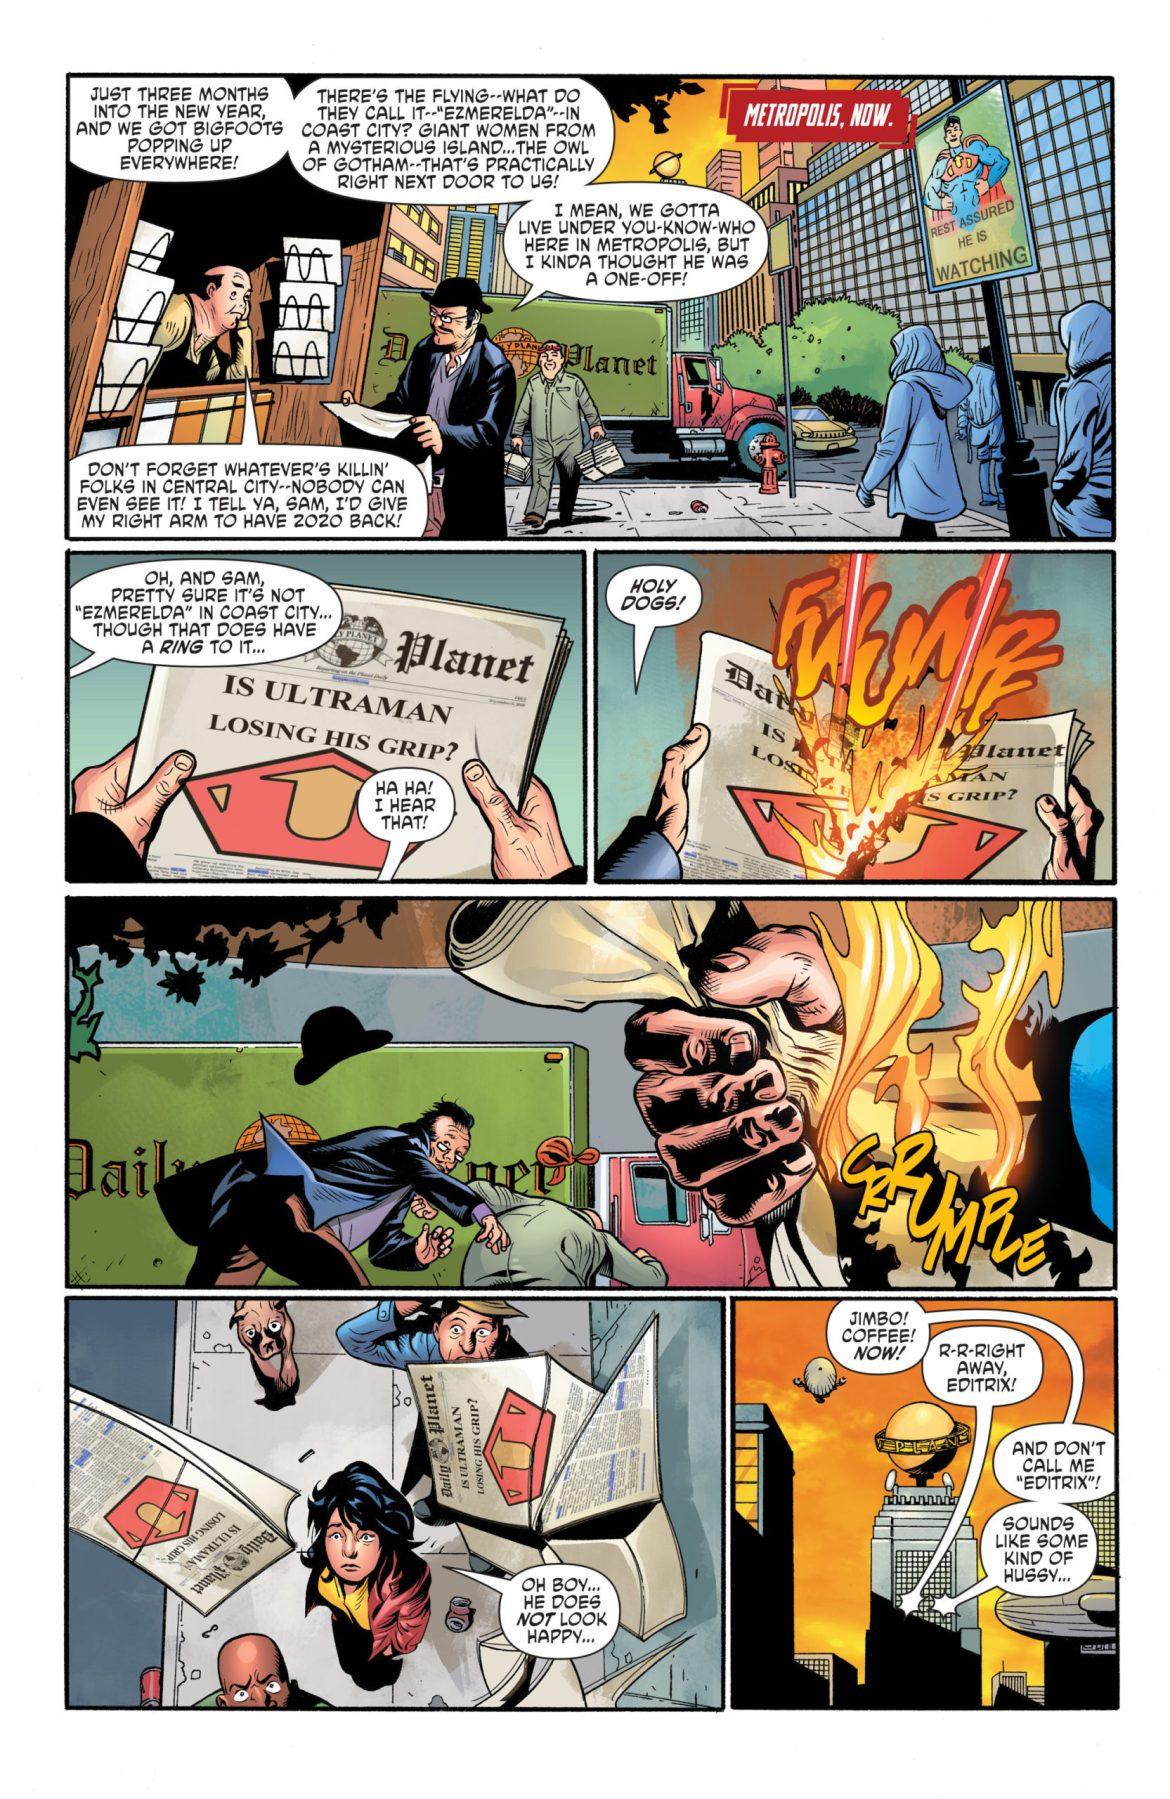 Crime Syndicate #1 DC Comics News